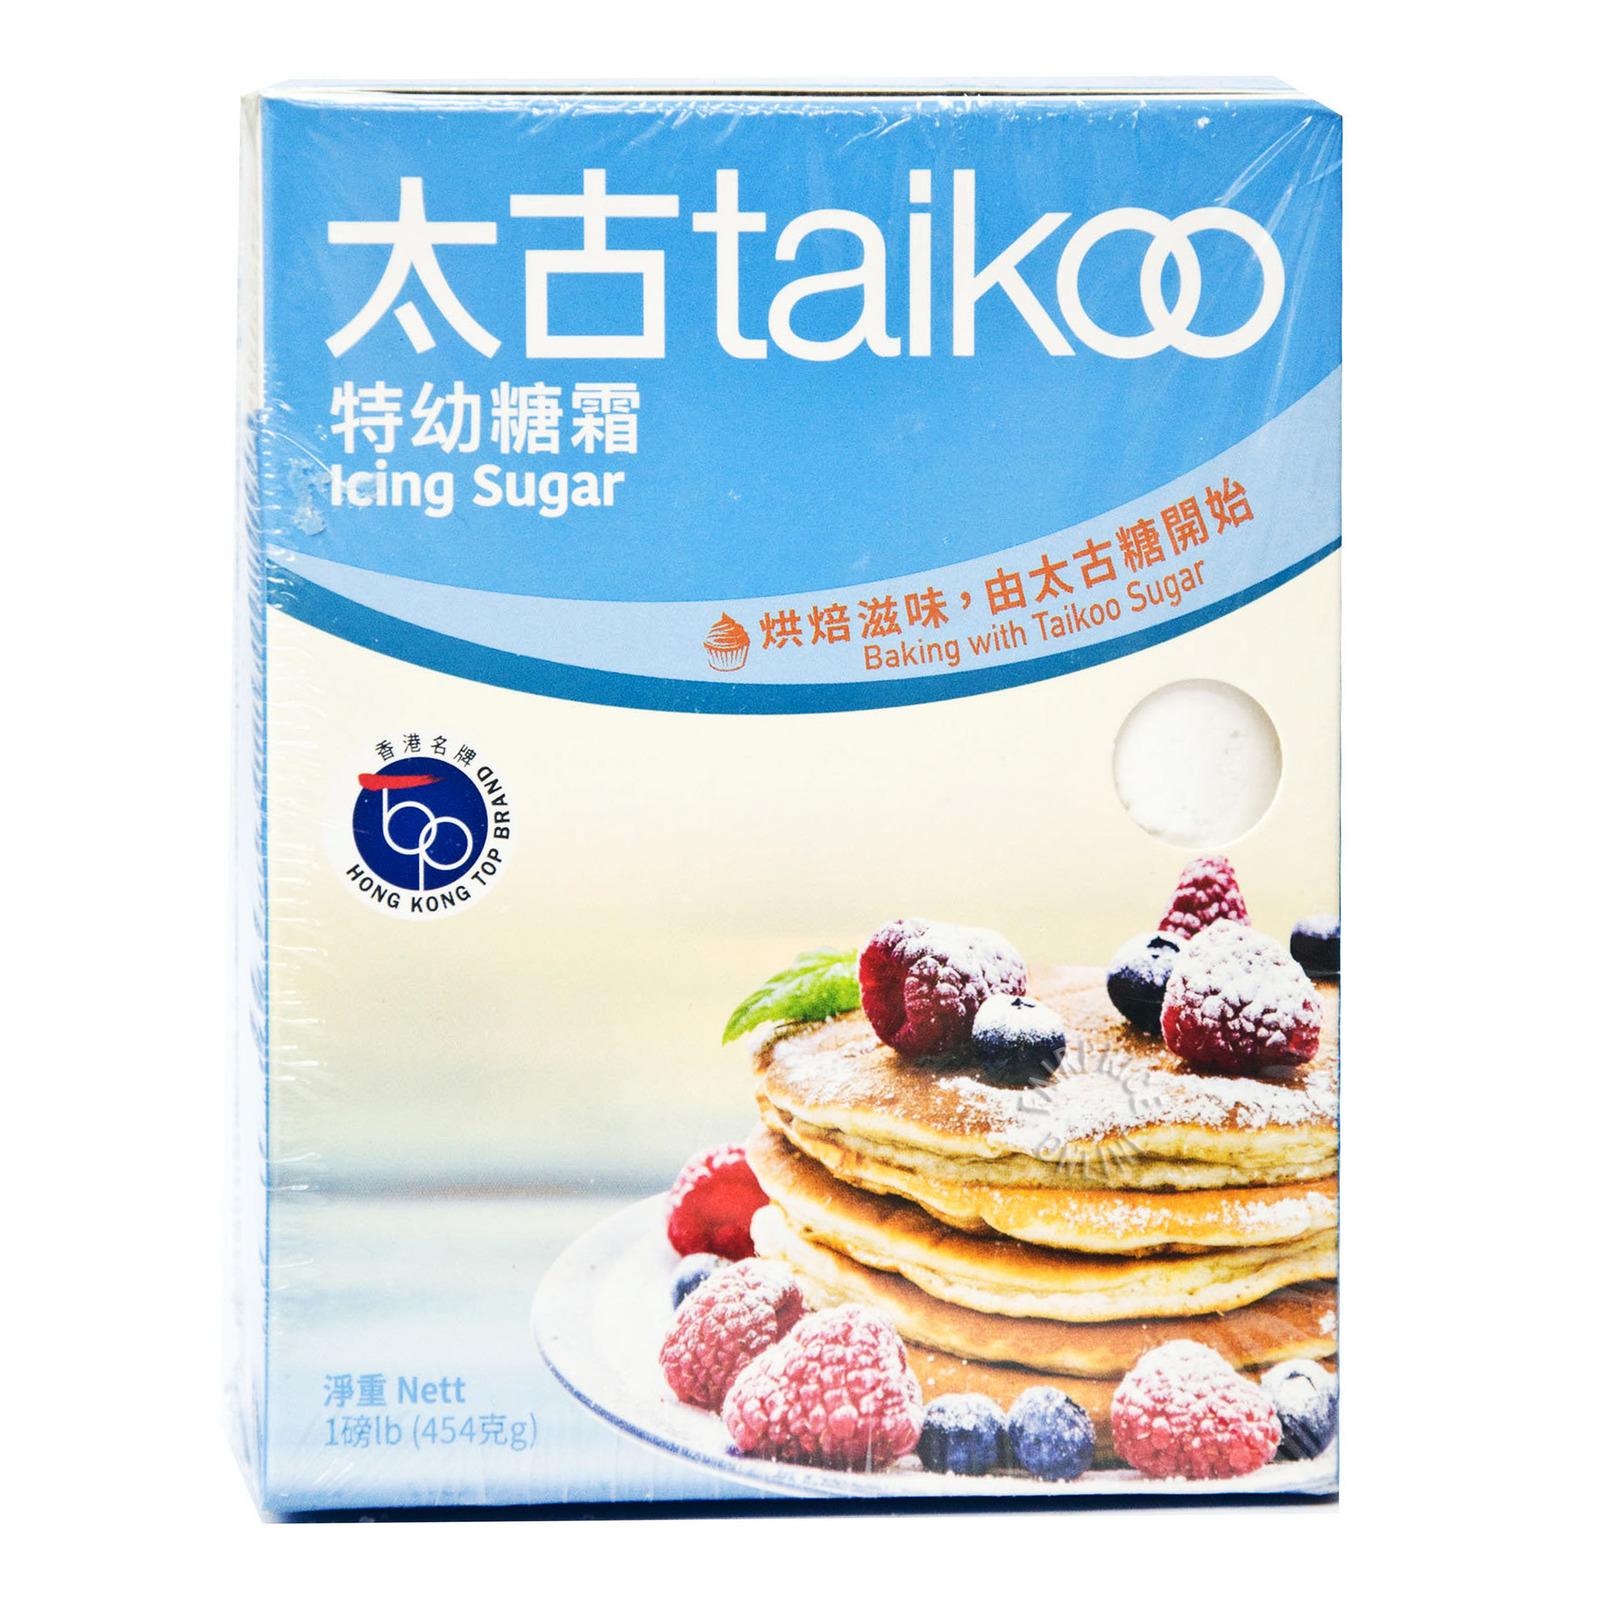 Taikoo Icing Sugar